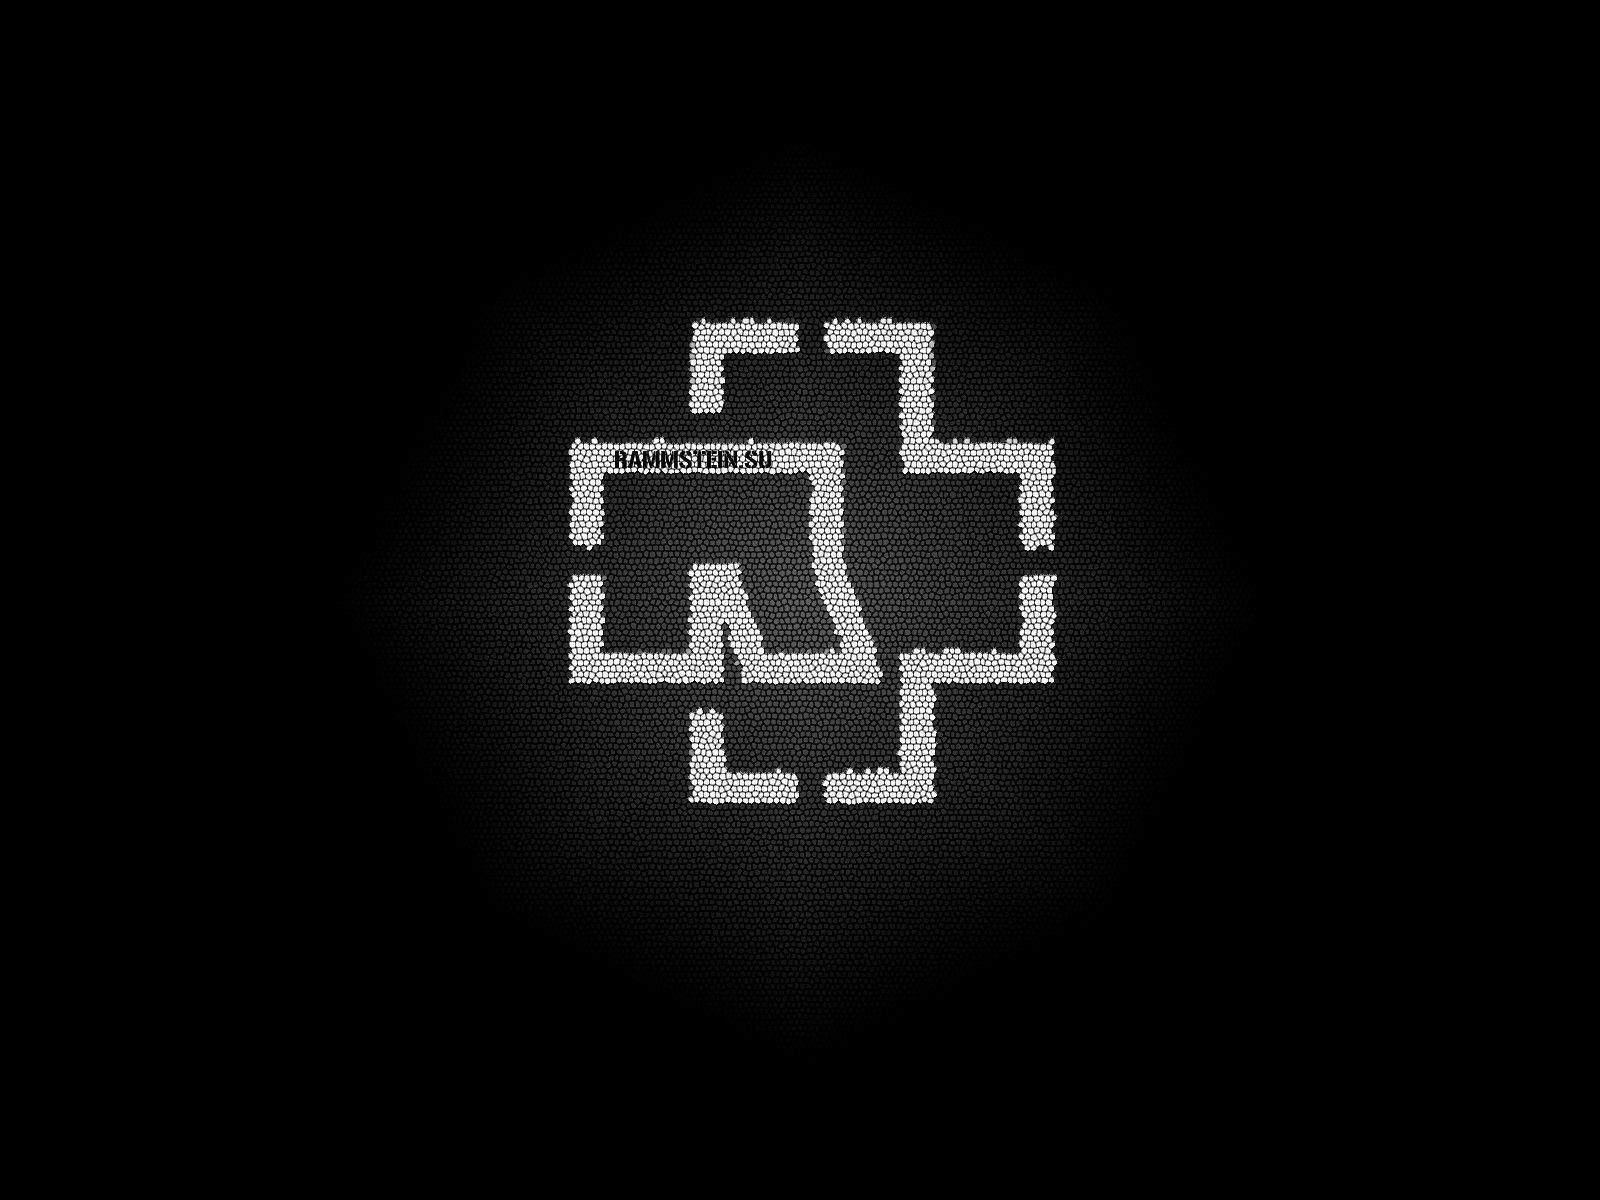 Rammstein Logo Wallpapers Wallpaper Cave